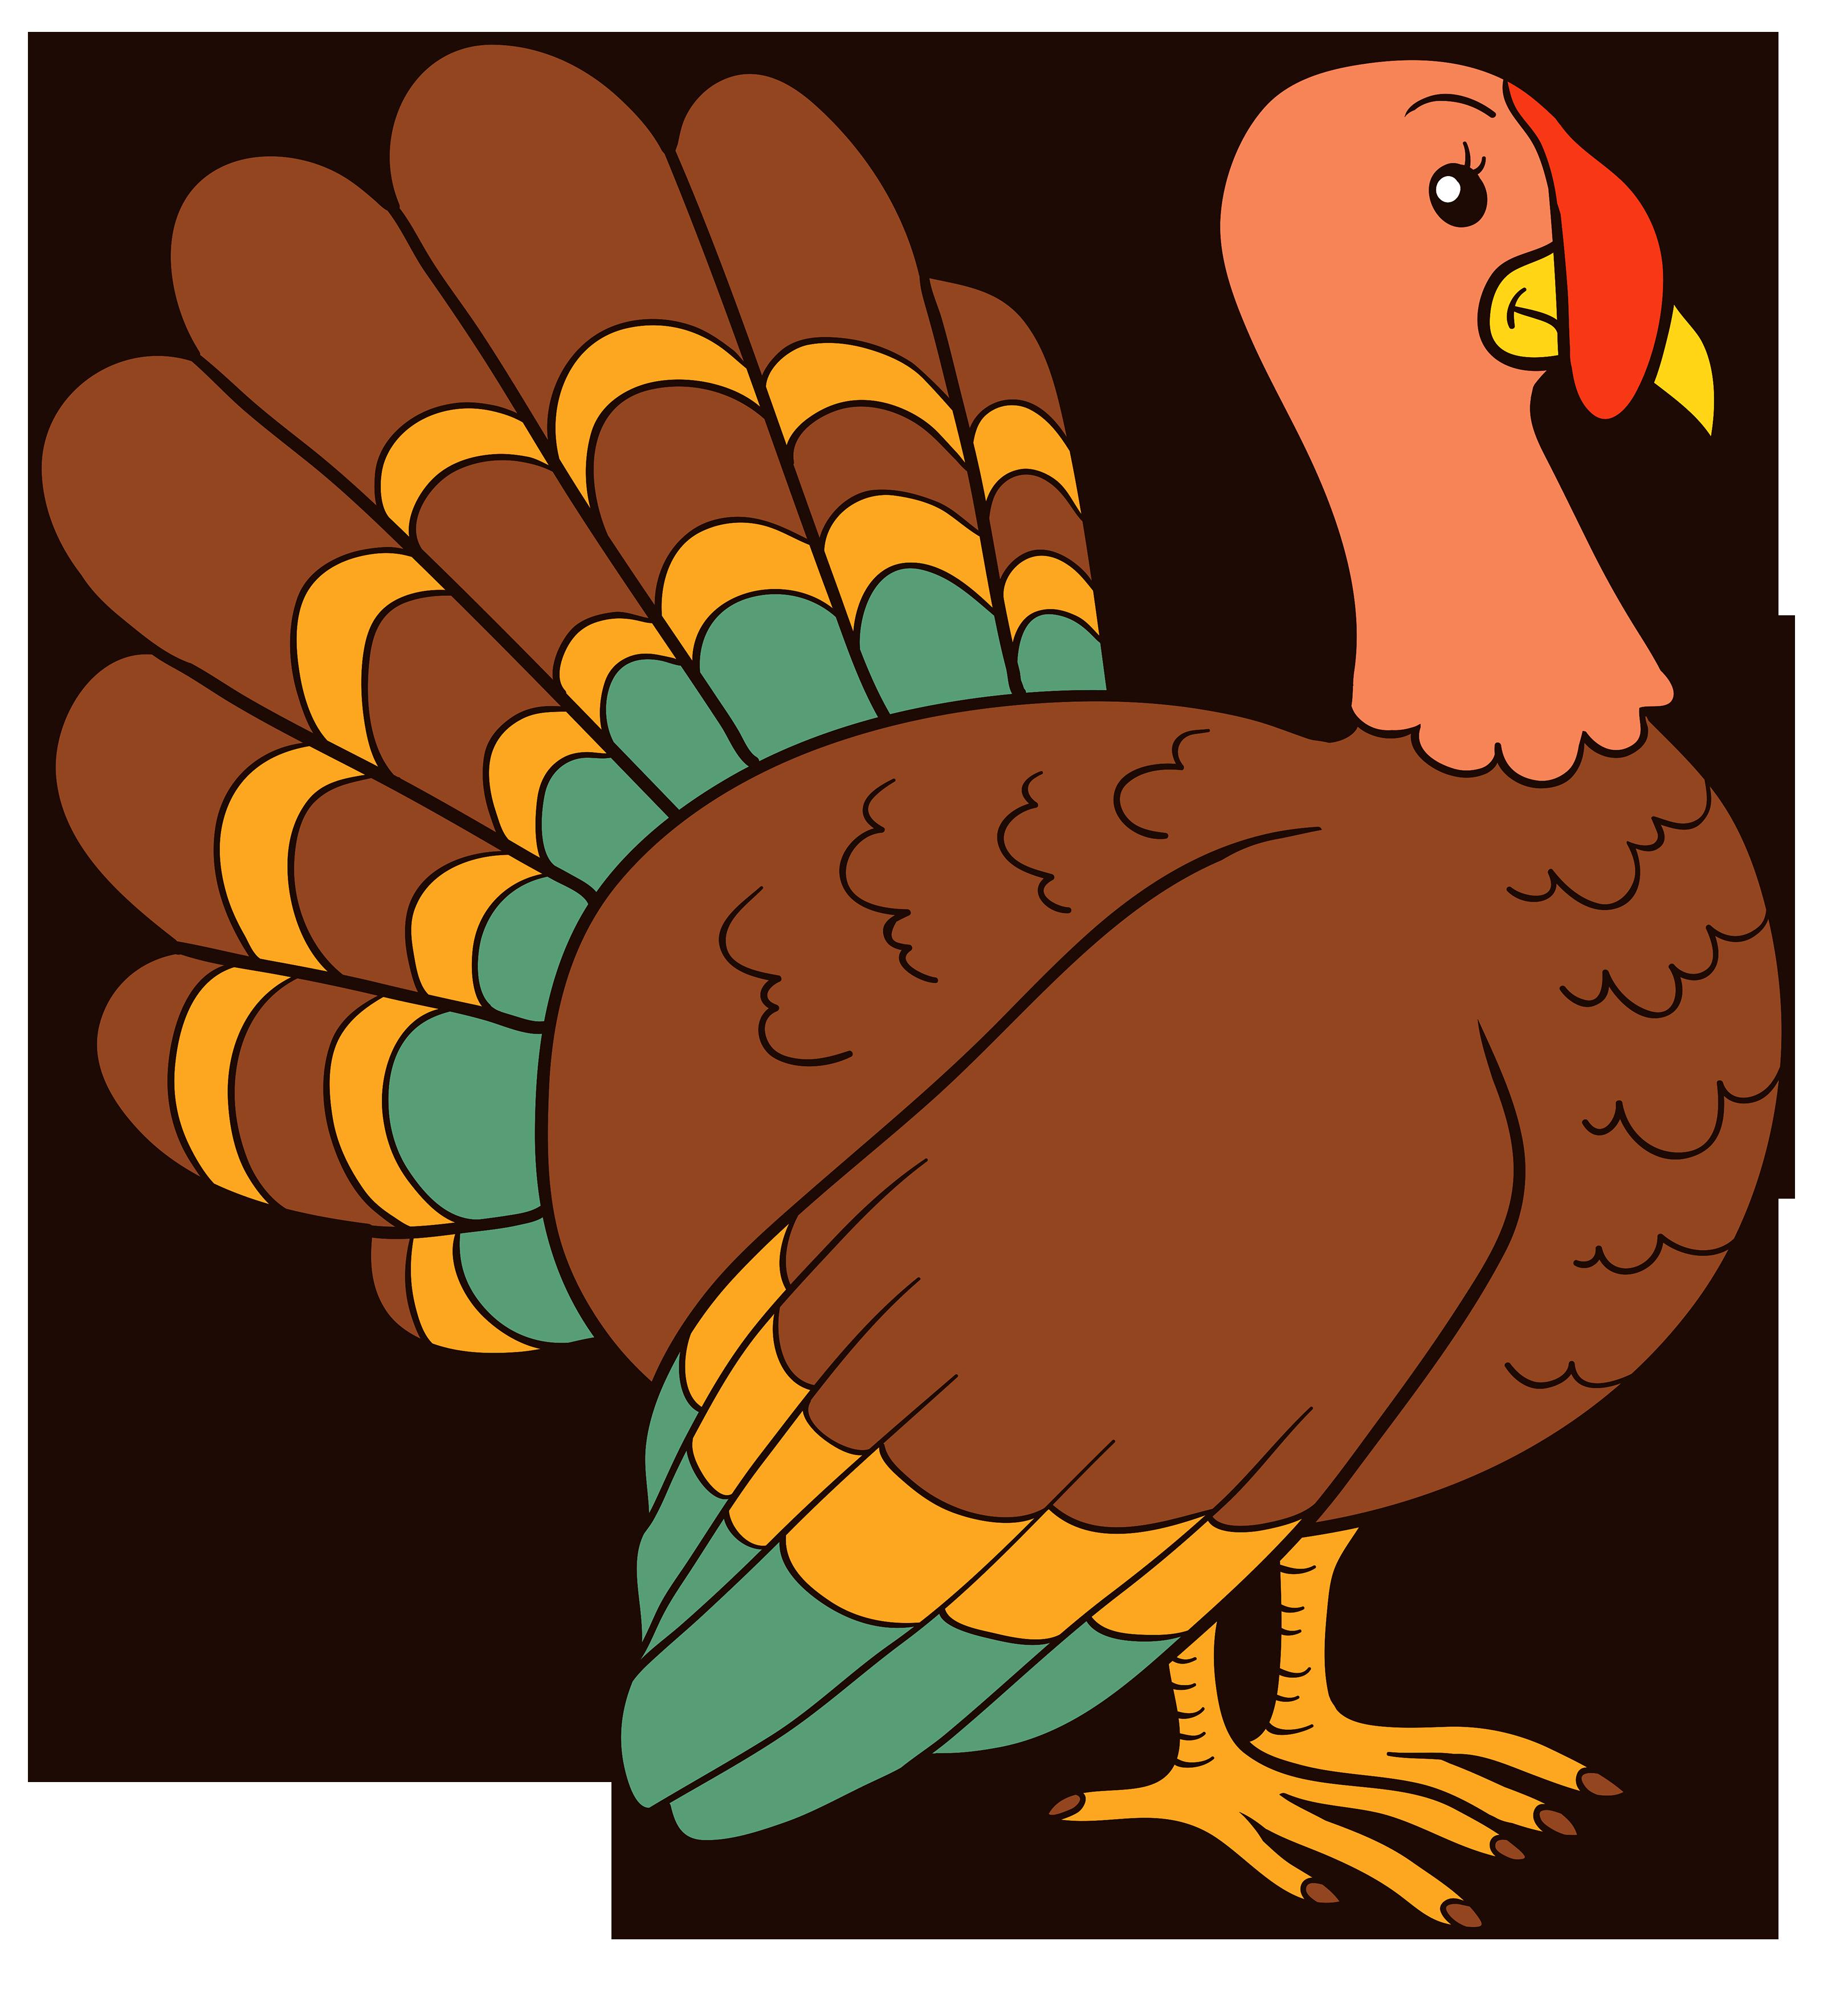 ... Turkey clip art - Vergilis Clipart .-... Turkey clip art - Vergilis Clipart ...-13